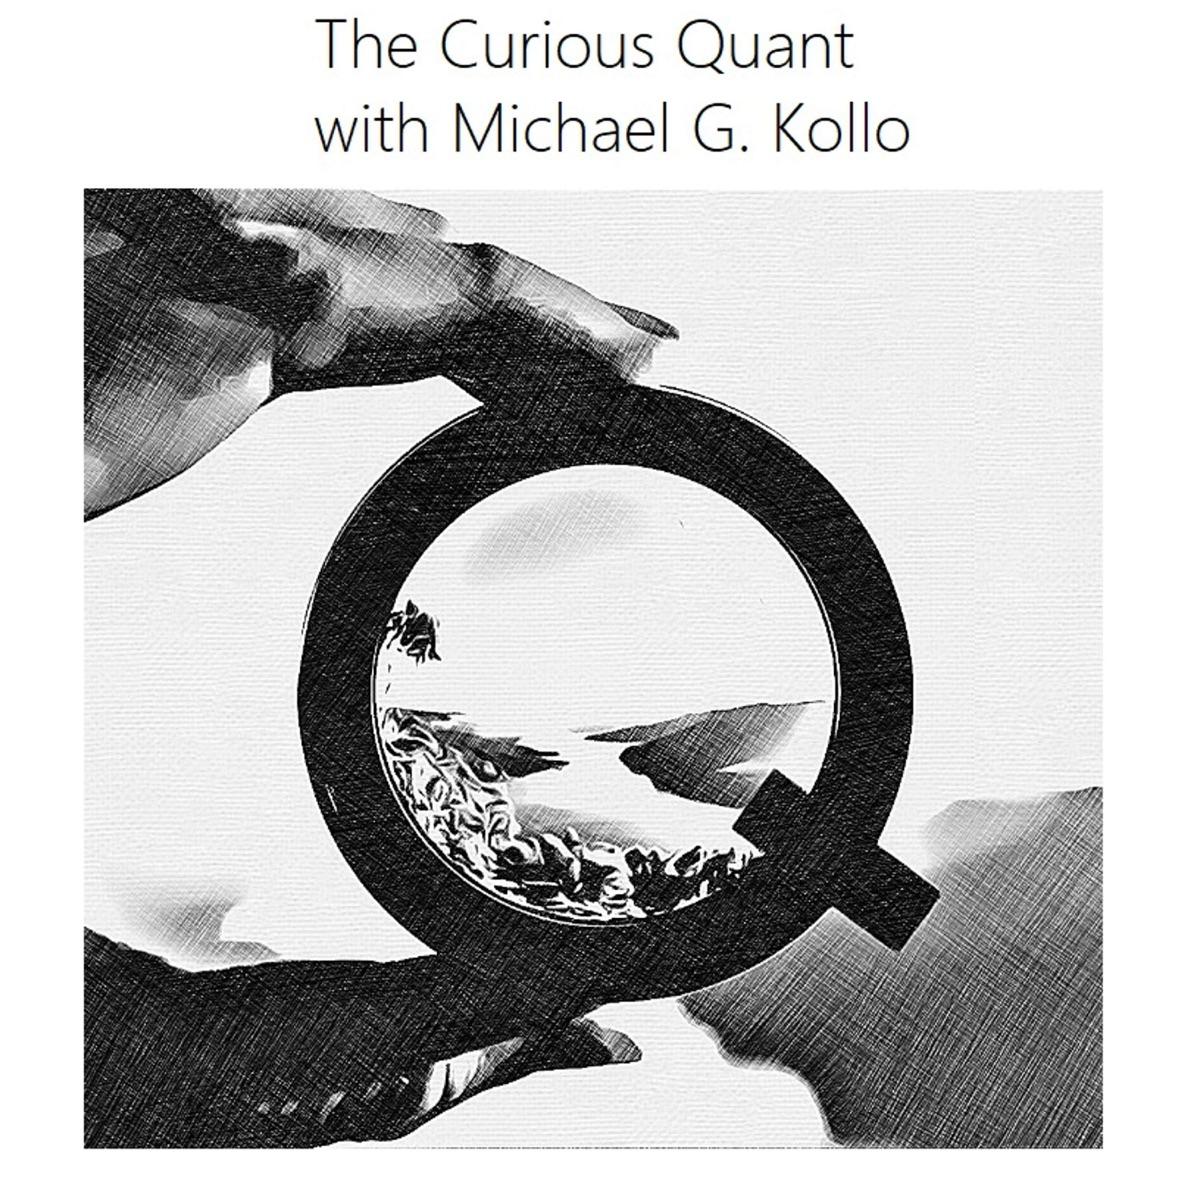 The Curious Quant